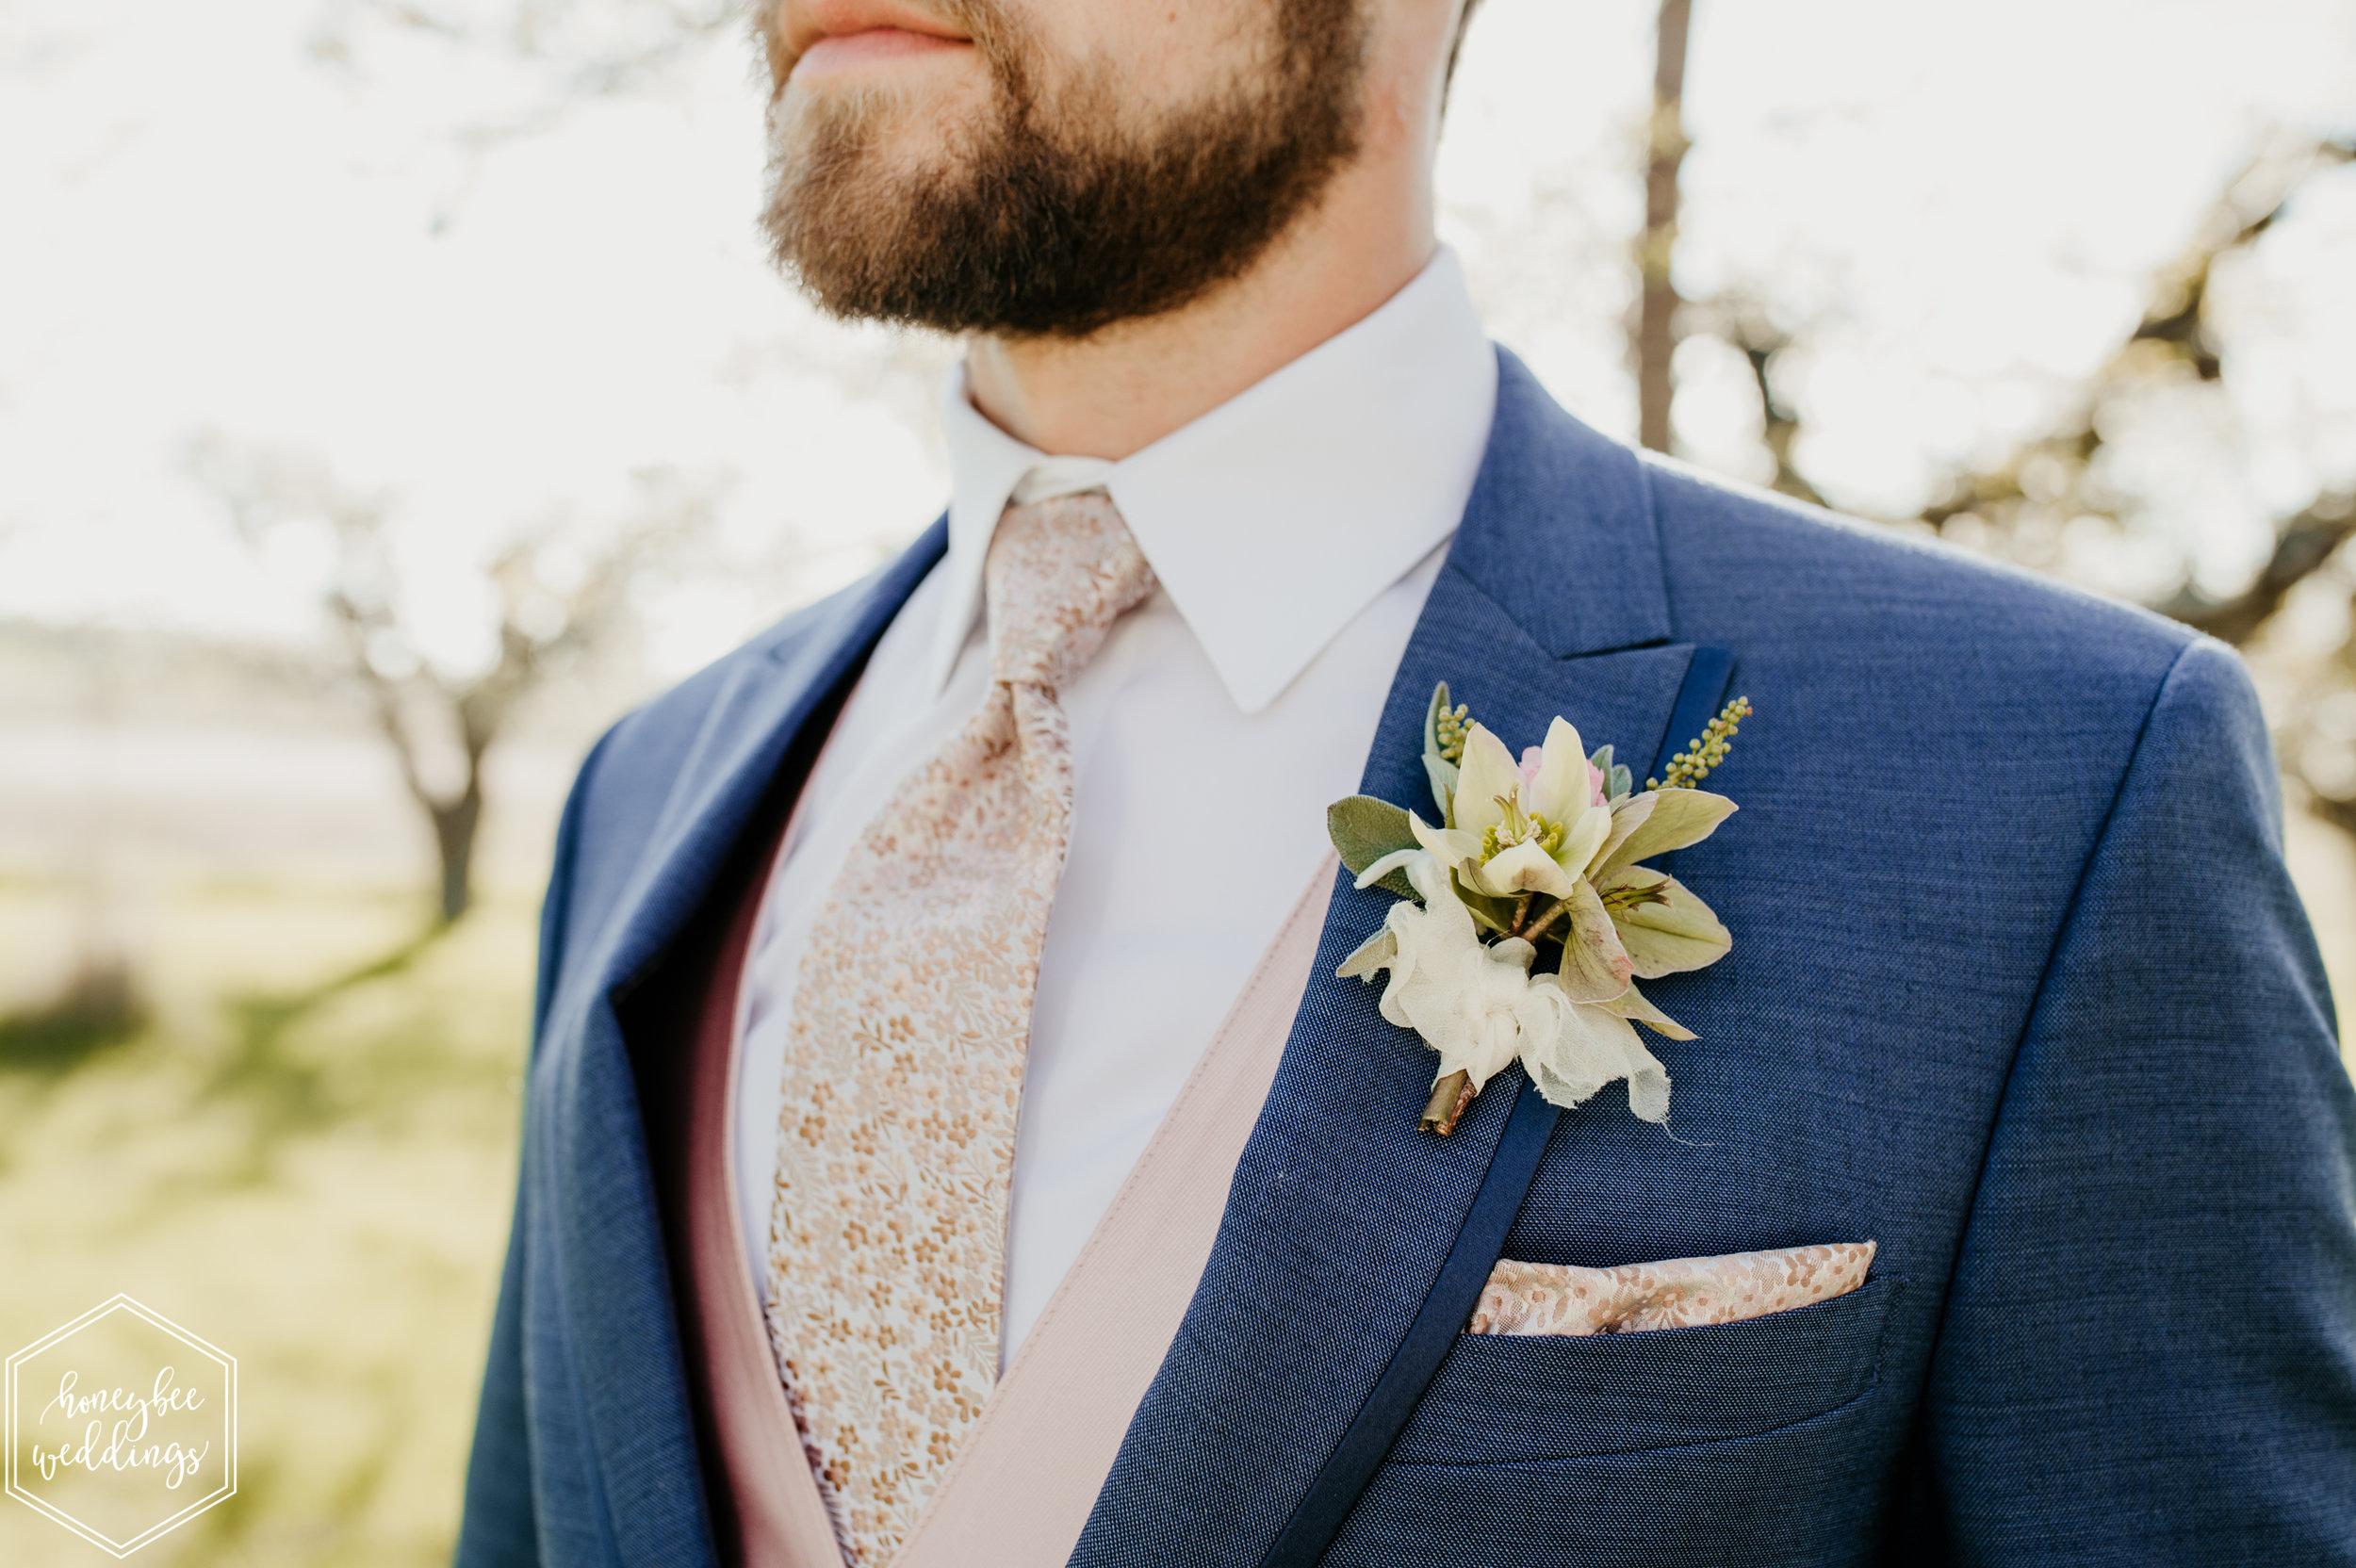 032Cherry Blossom Wedding_Styled Photoshoot_Honeybee Weddings_May 11, 2019-93.jpg